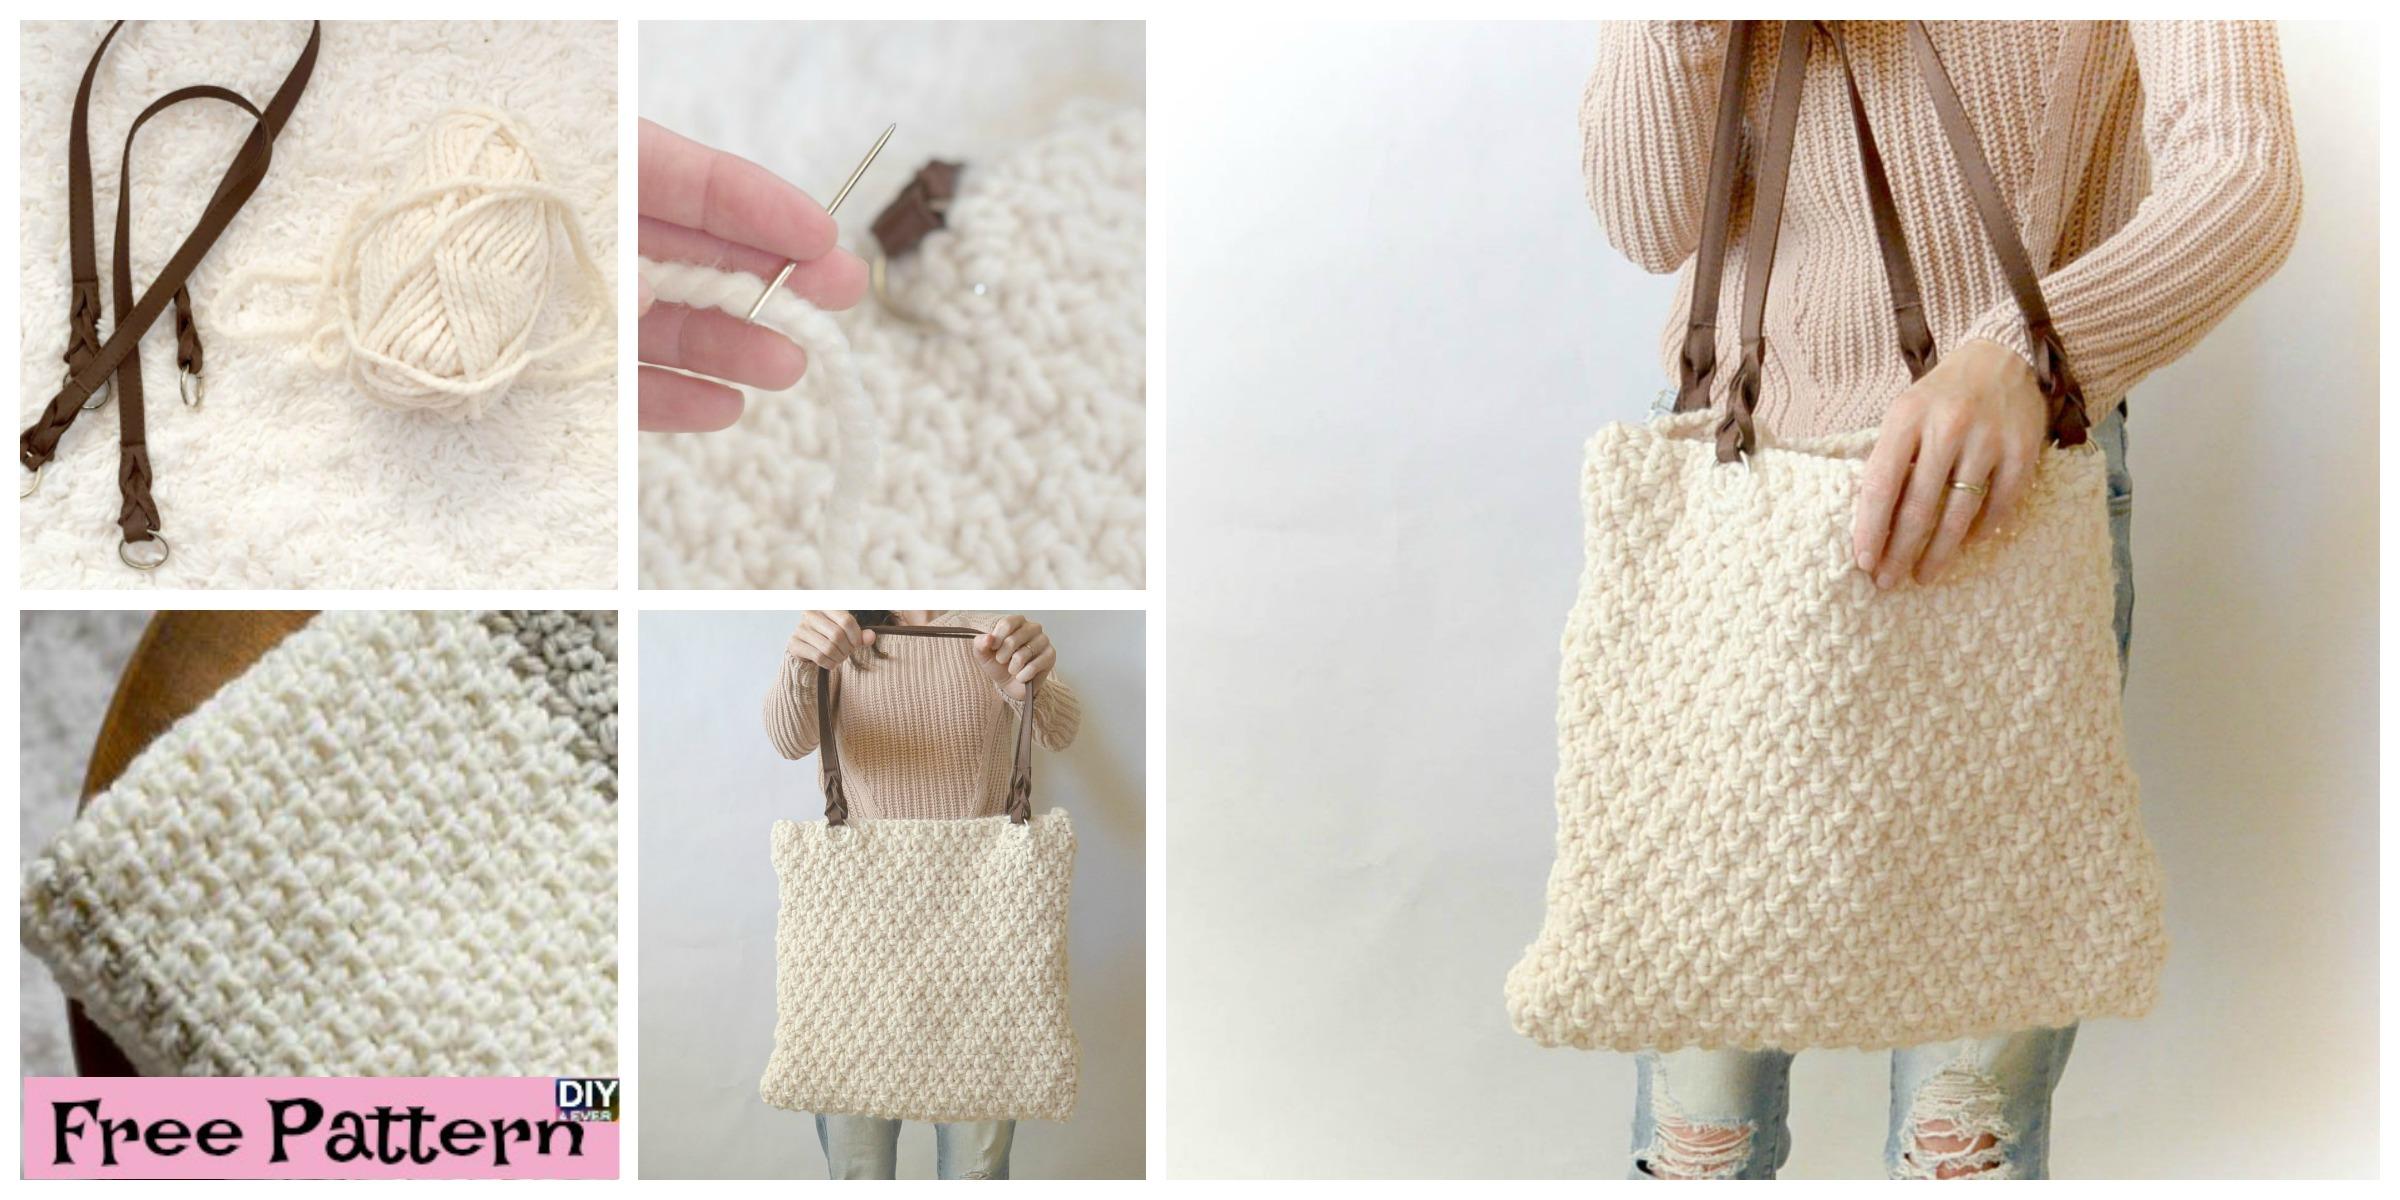 Double Seed Stitch Knit Bag – Free Pattern